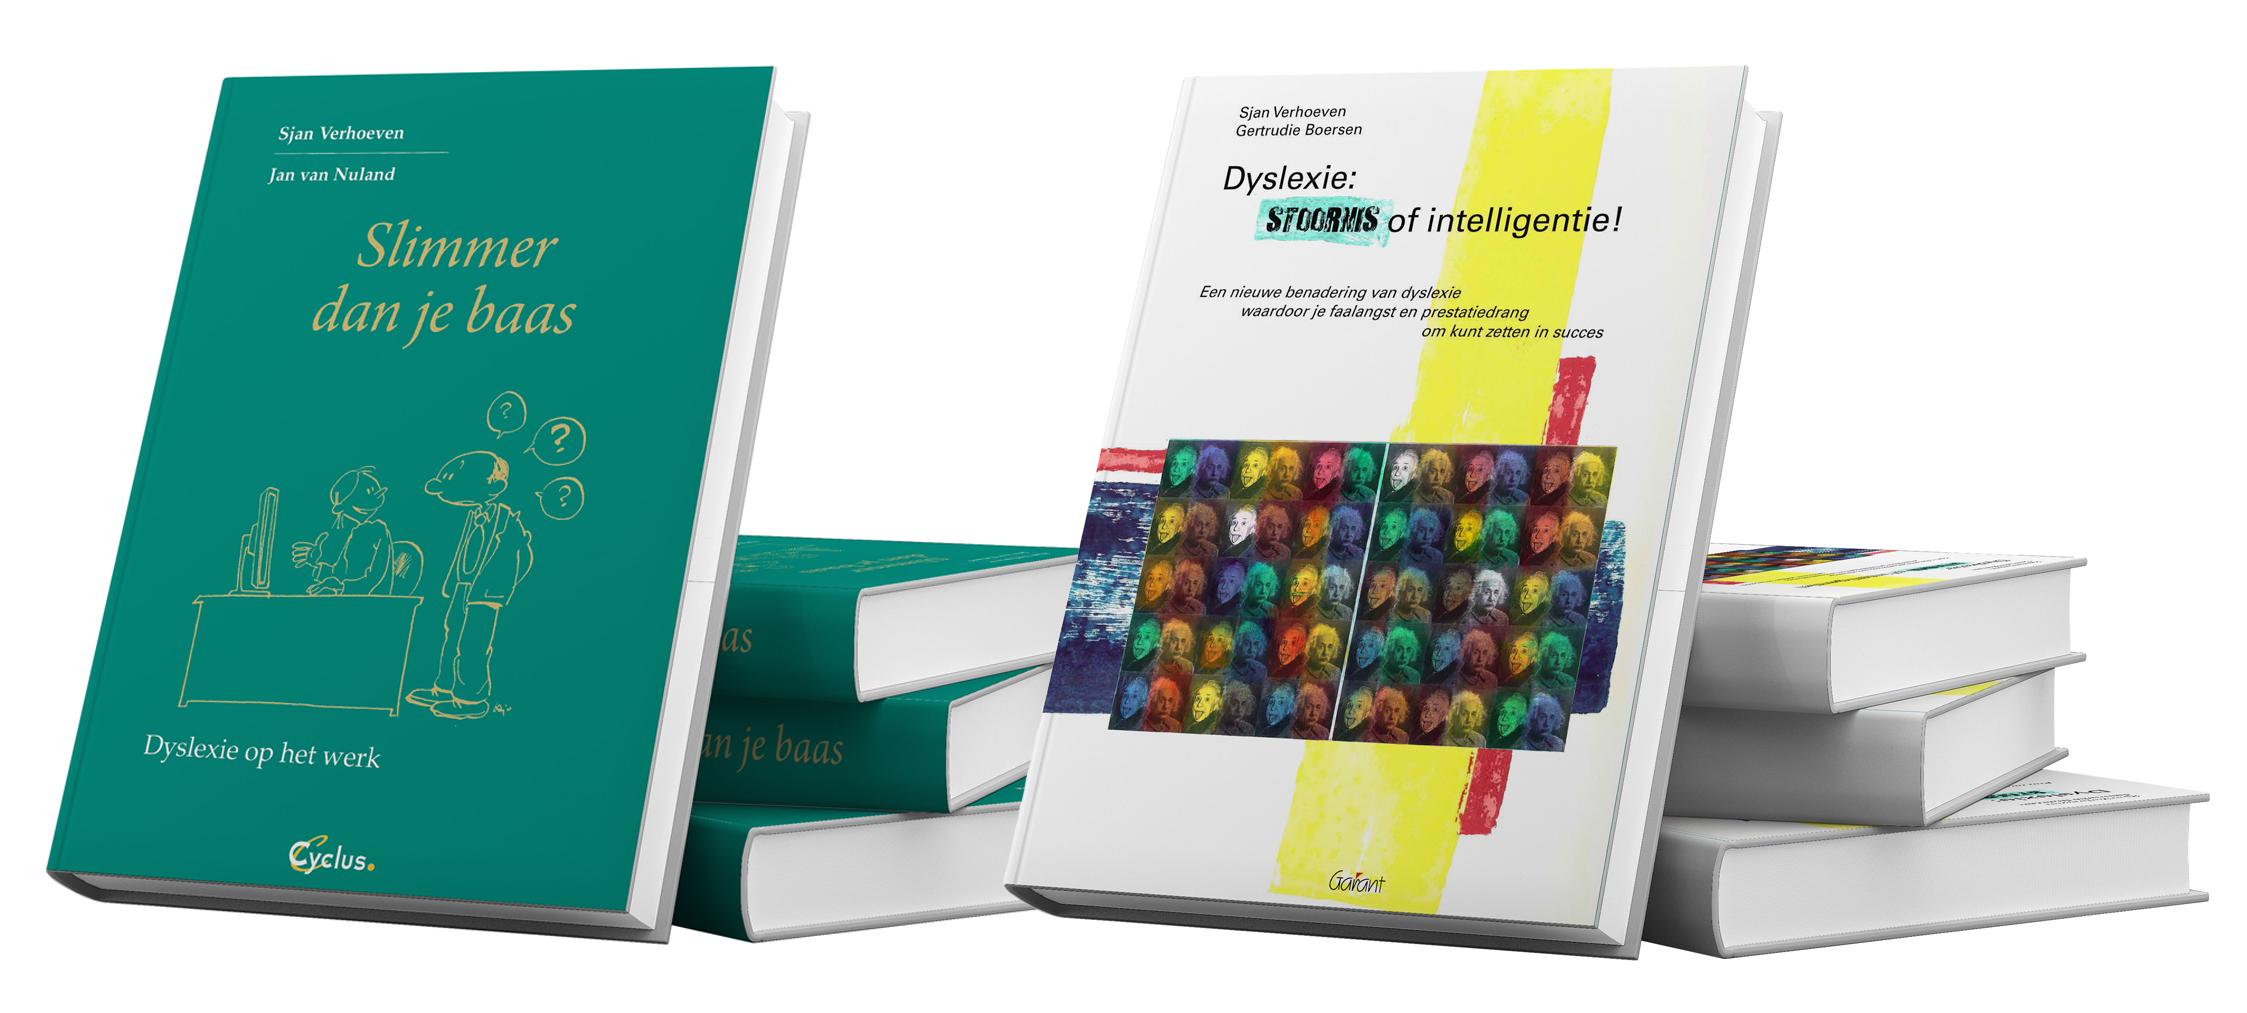 Afbeelding van de boeken 'Slimmer dan je baas' en 'Dyslexie: Stoornis of intelligentie'